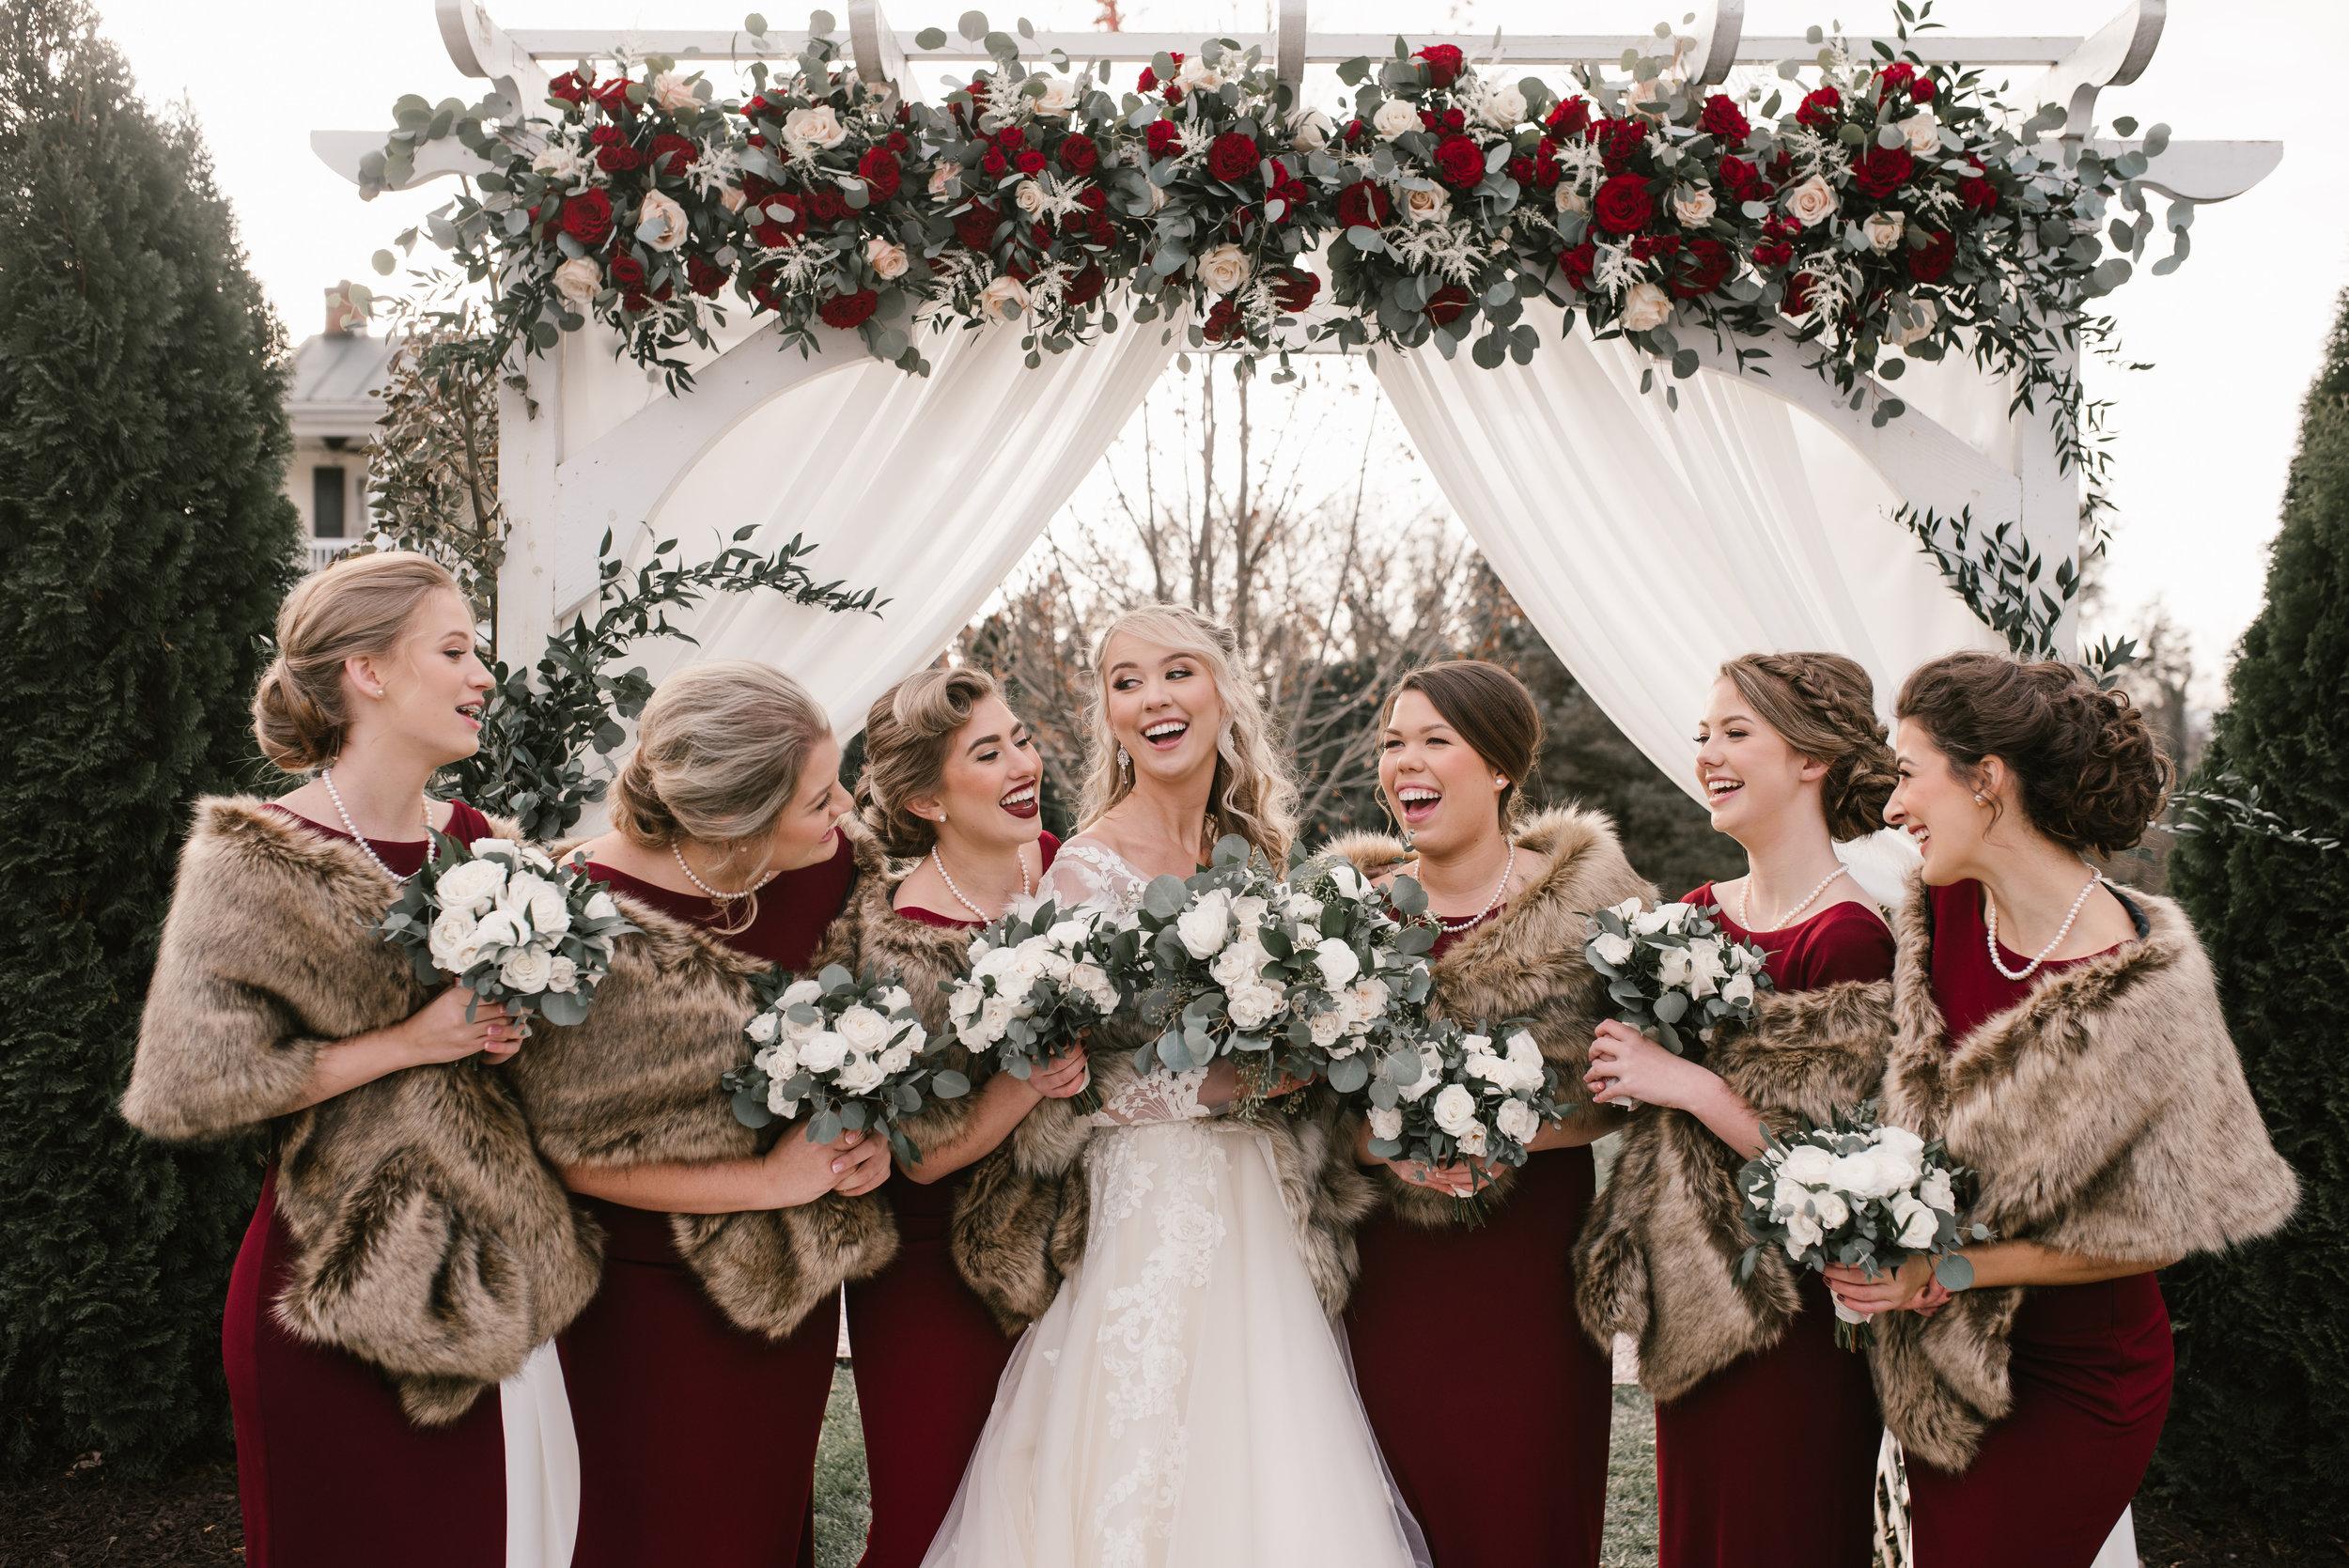 antrim-18444-spencer-wedding-1046.jpg